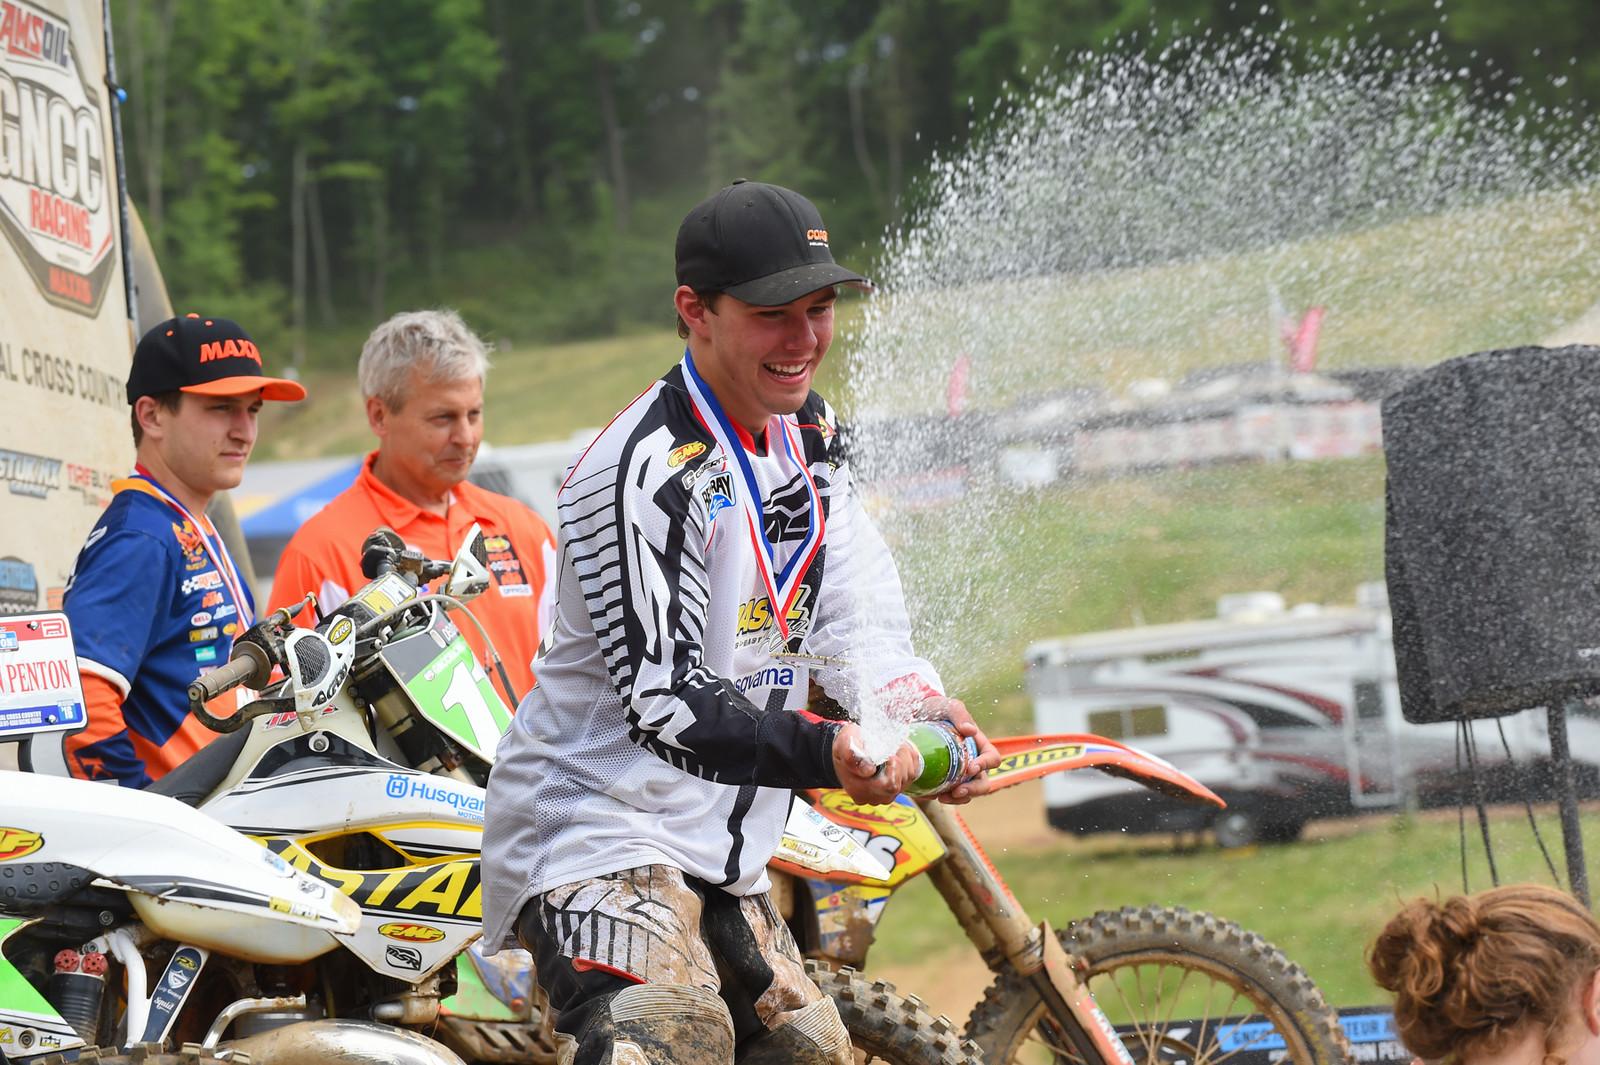 Champagne time - John Penton GNCC - Motocross Pictures - Vital MX